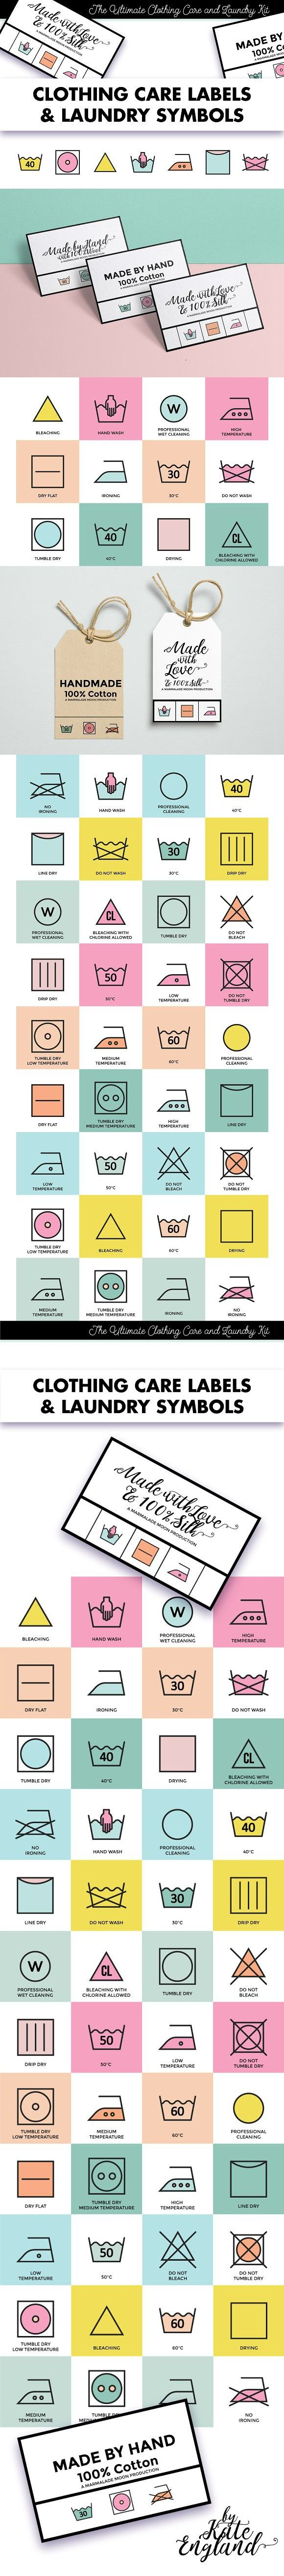 The 25 best laundry labels ideas on pinterest laundry sorting clothing labels and laundry symbols buycottarizona